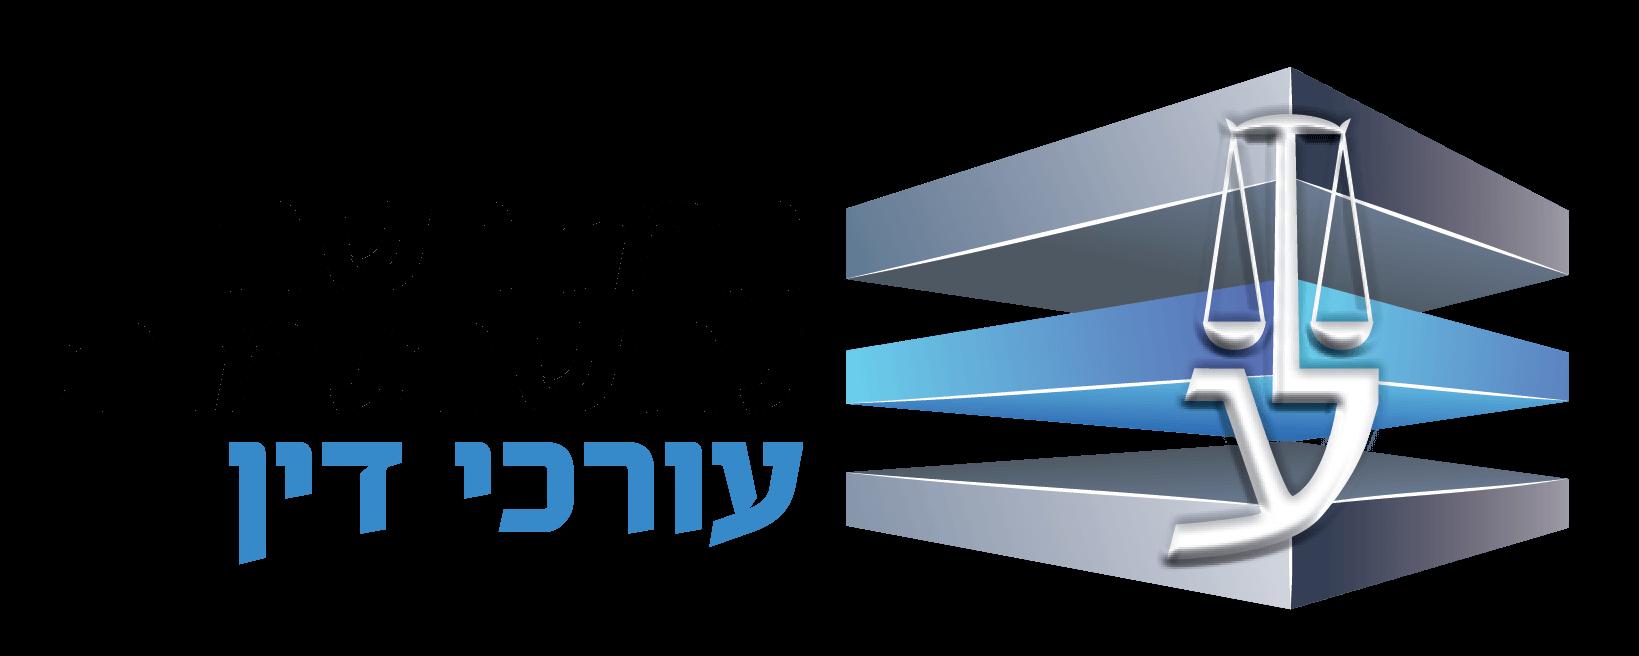 Midrashalaw Logo